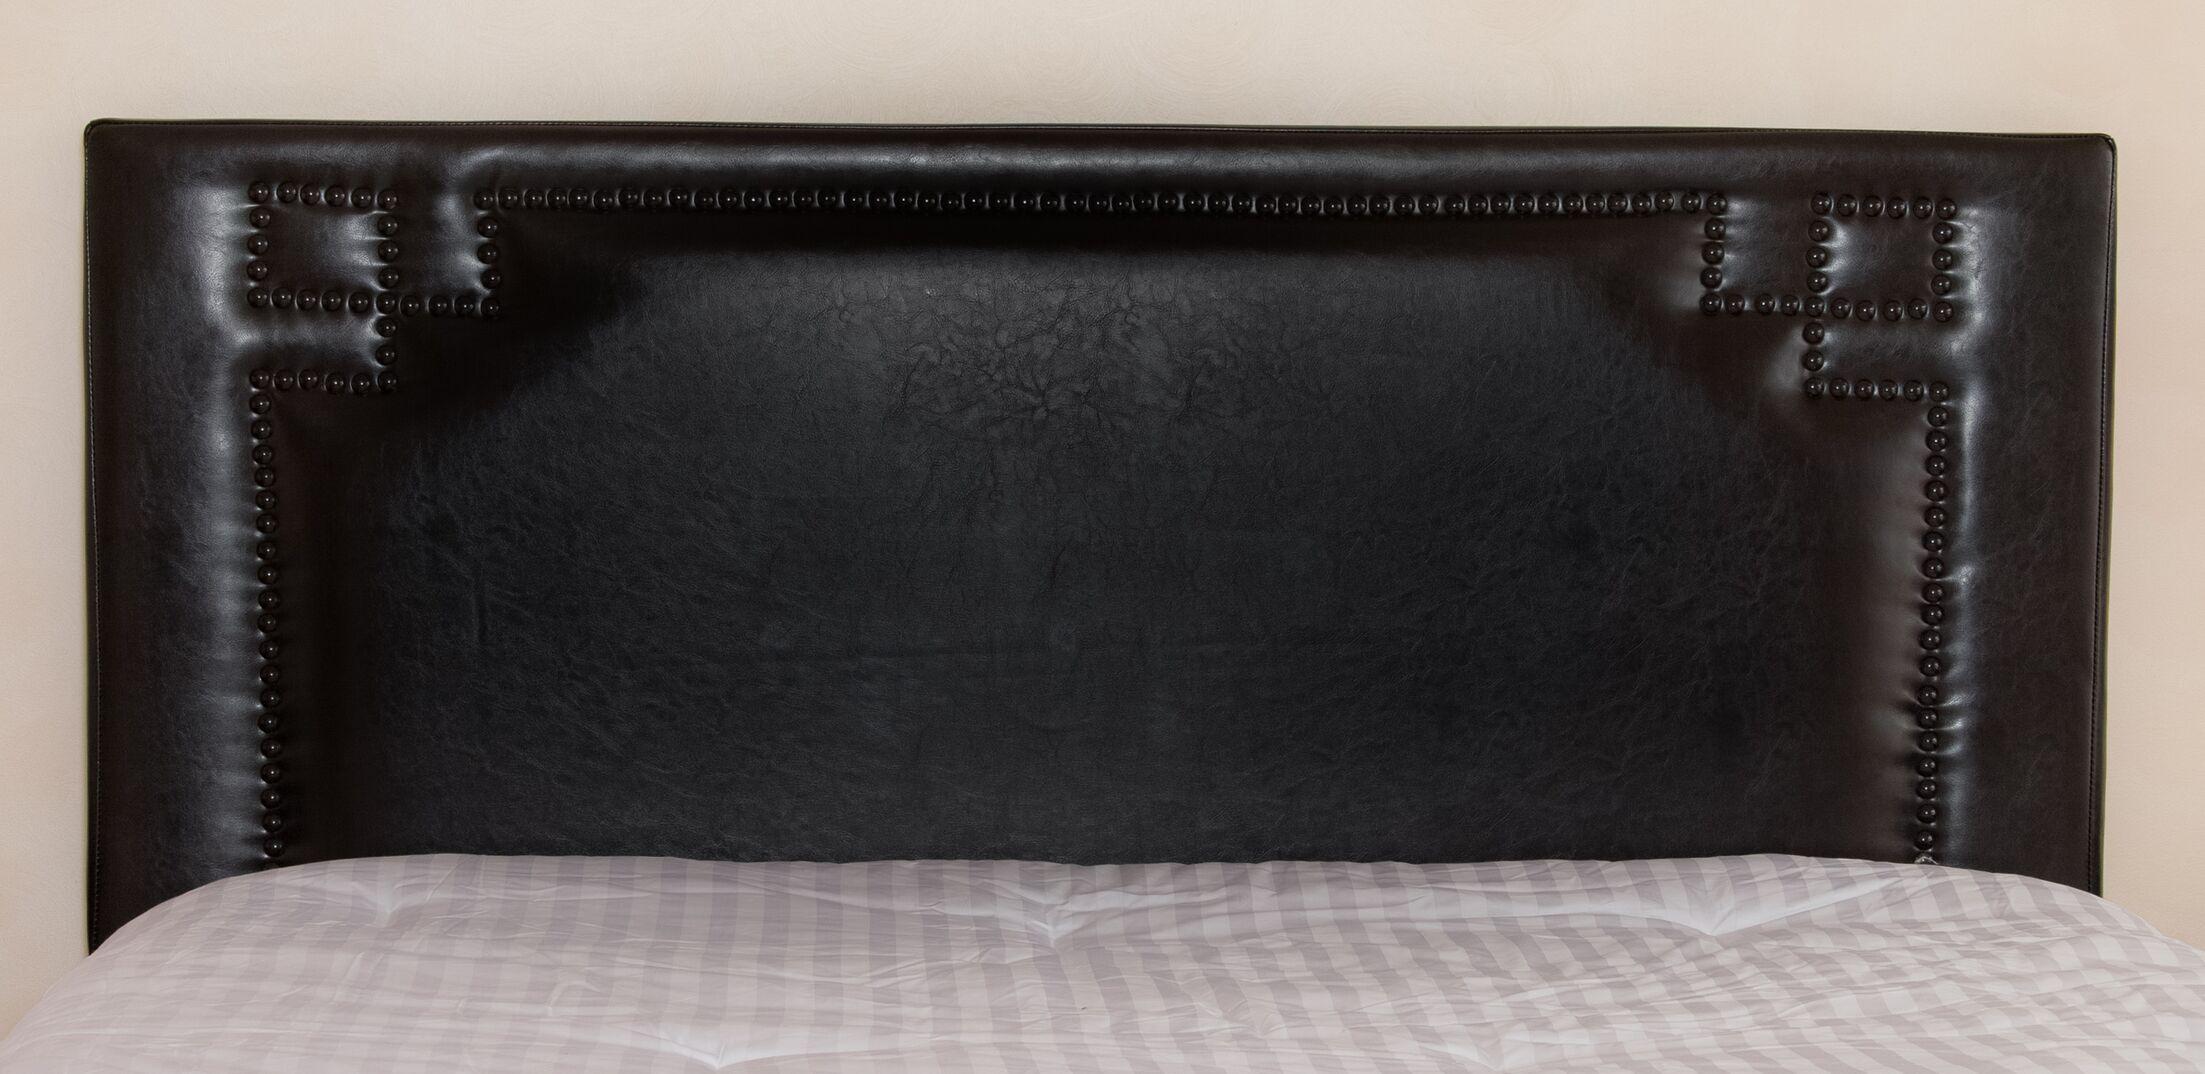 Tannyson Queen Upholstered Panel Headboard